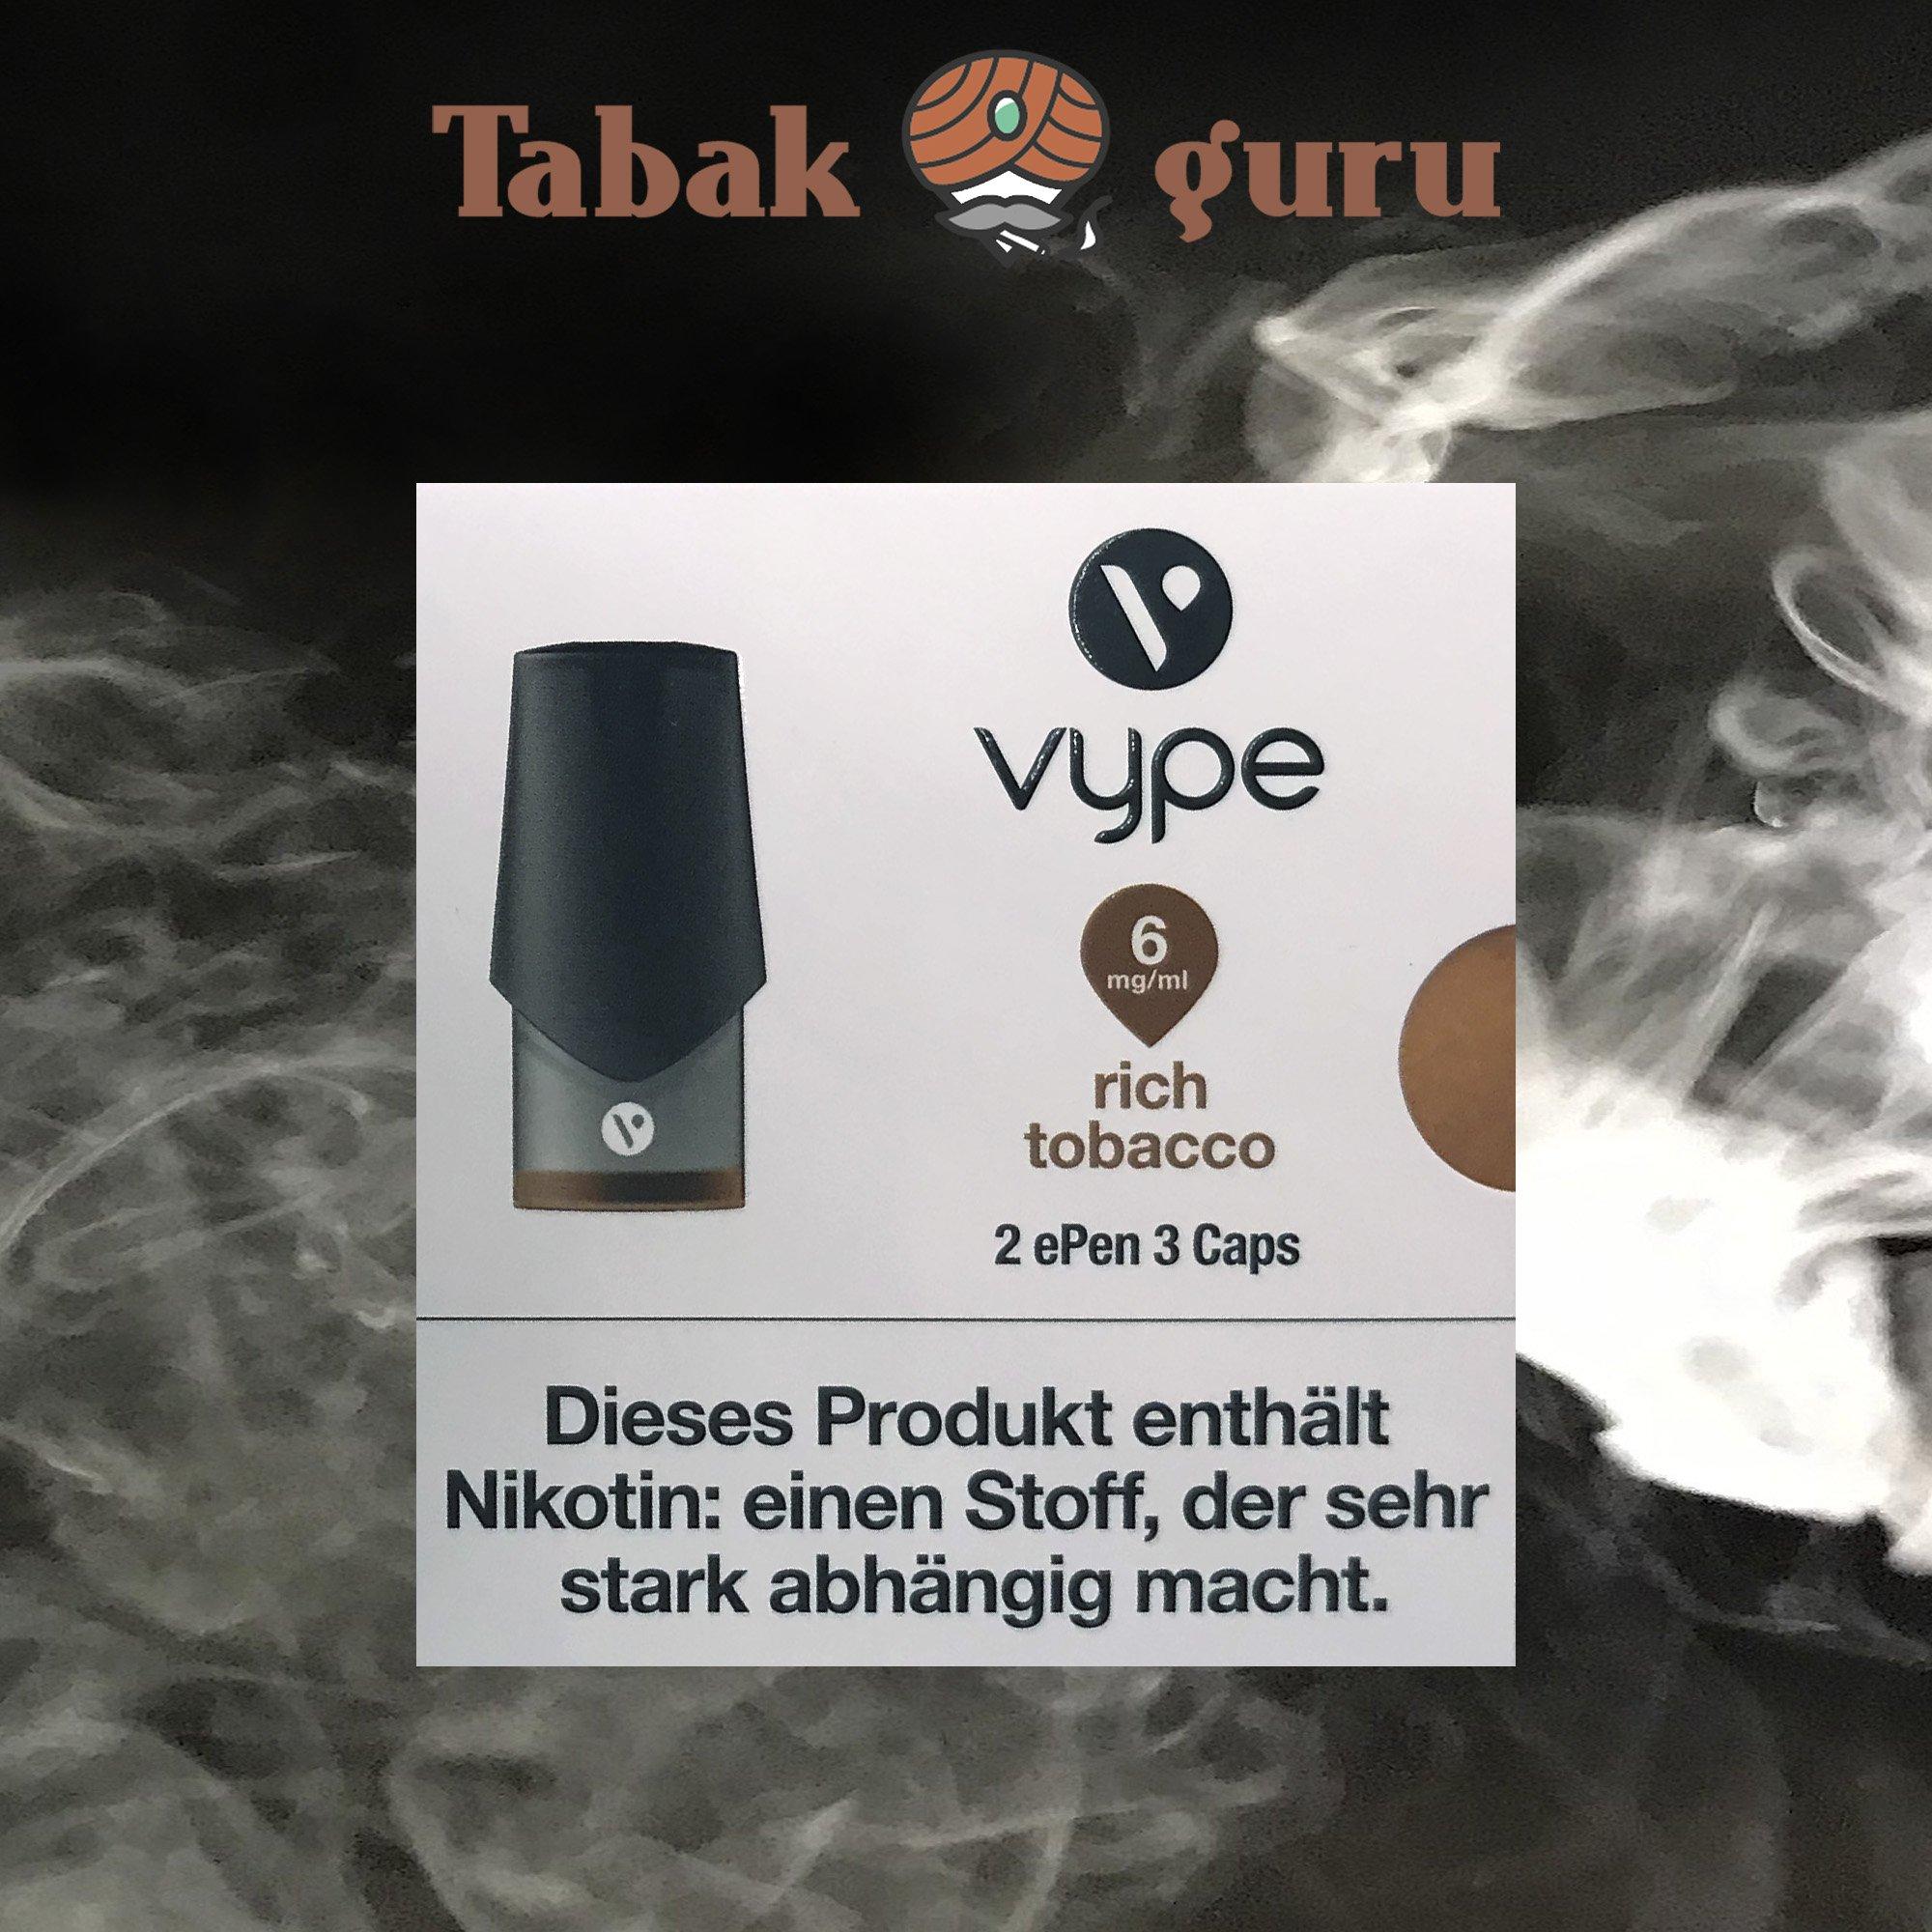 Vype ePen3 Caps Rich Tobacco 6 mg/ml Inhalt 2 Caps